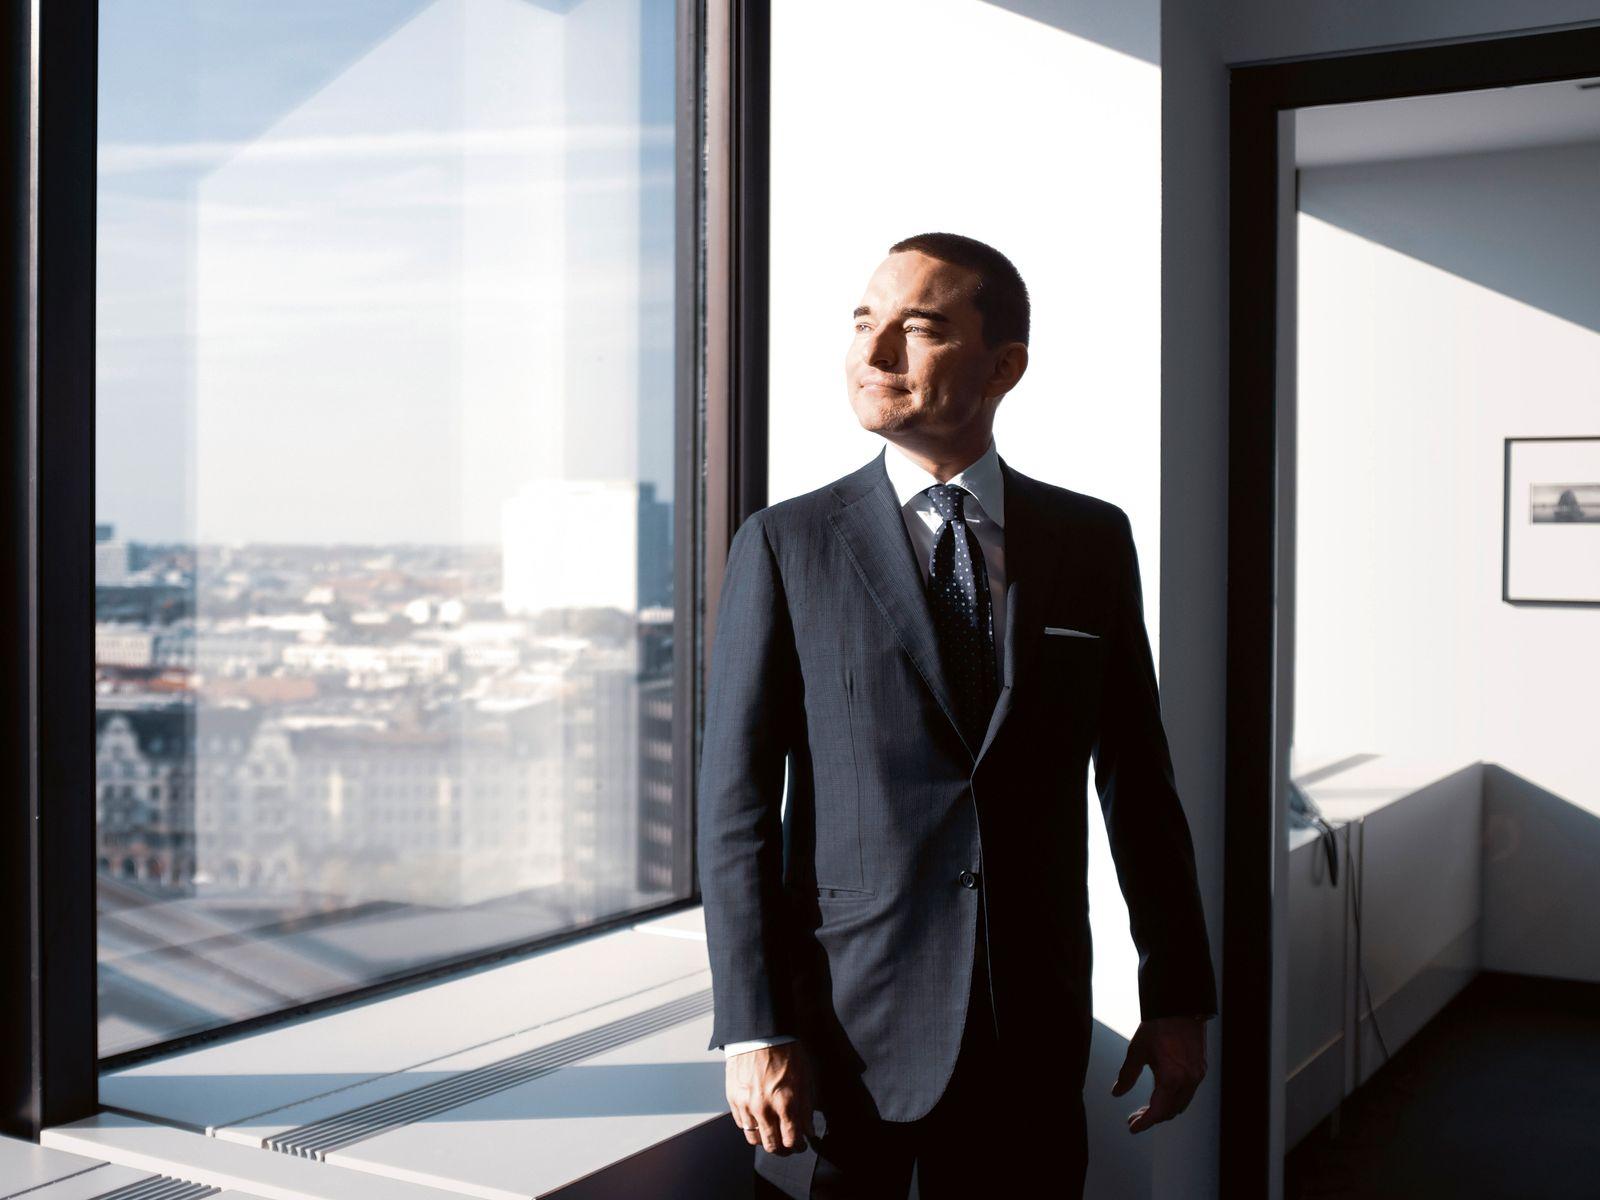 Lars Windhorst / Markus C. Hurek